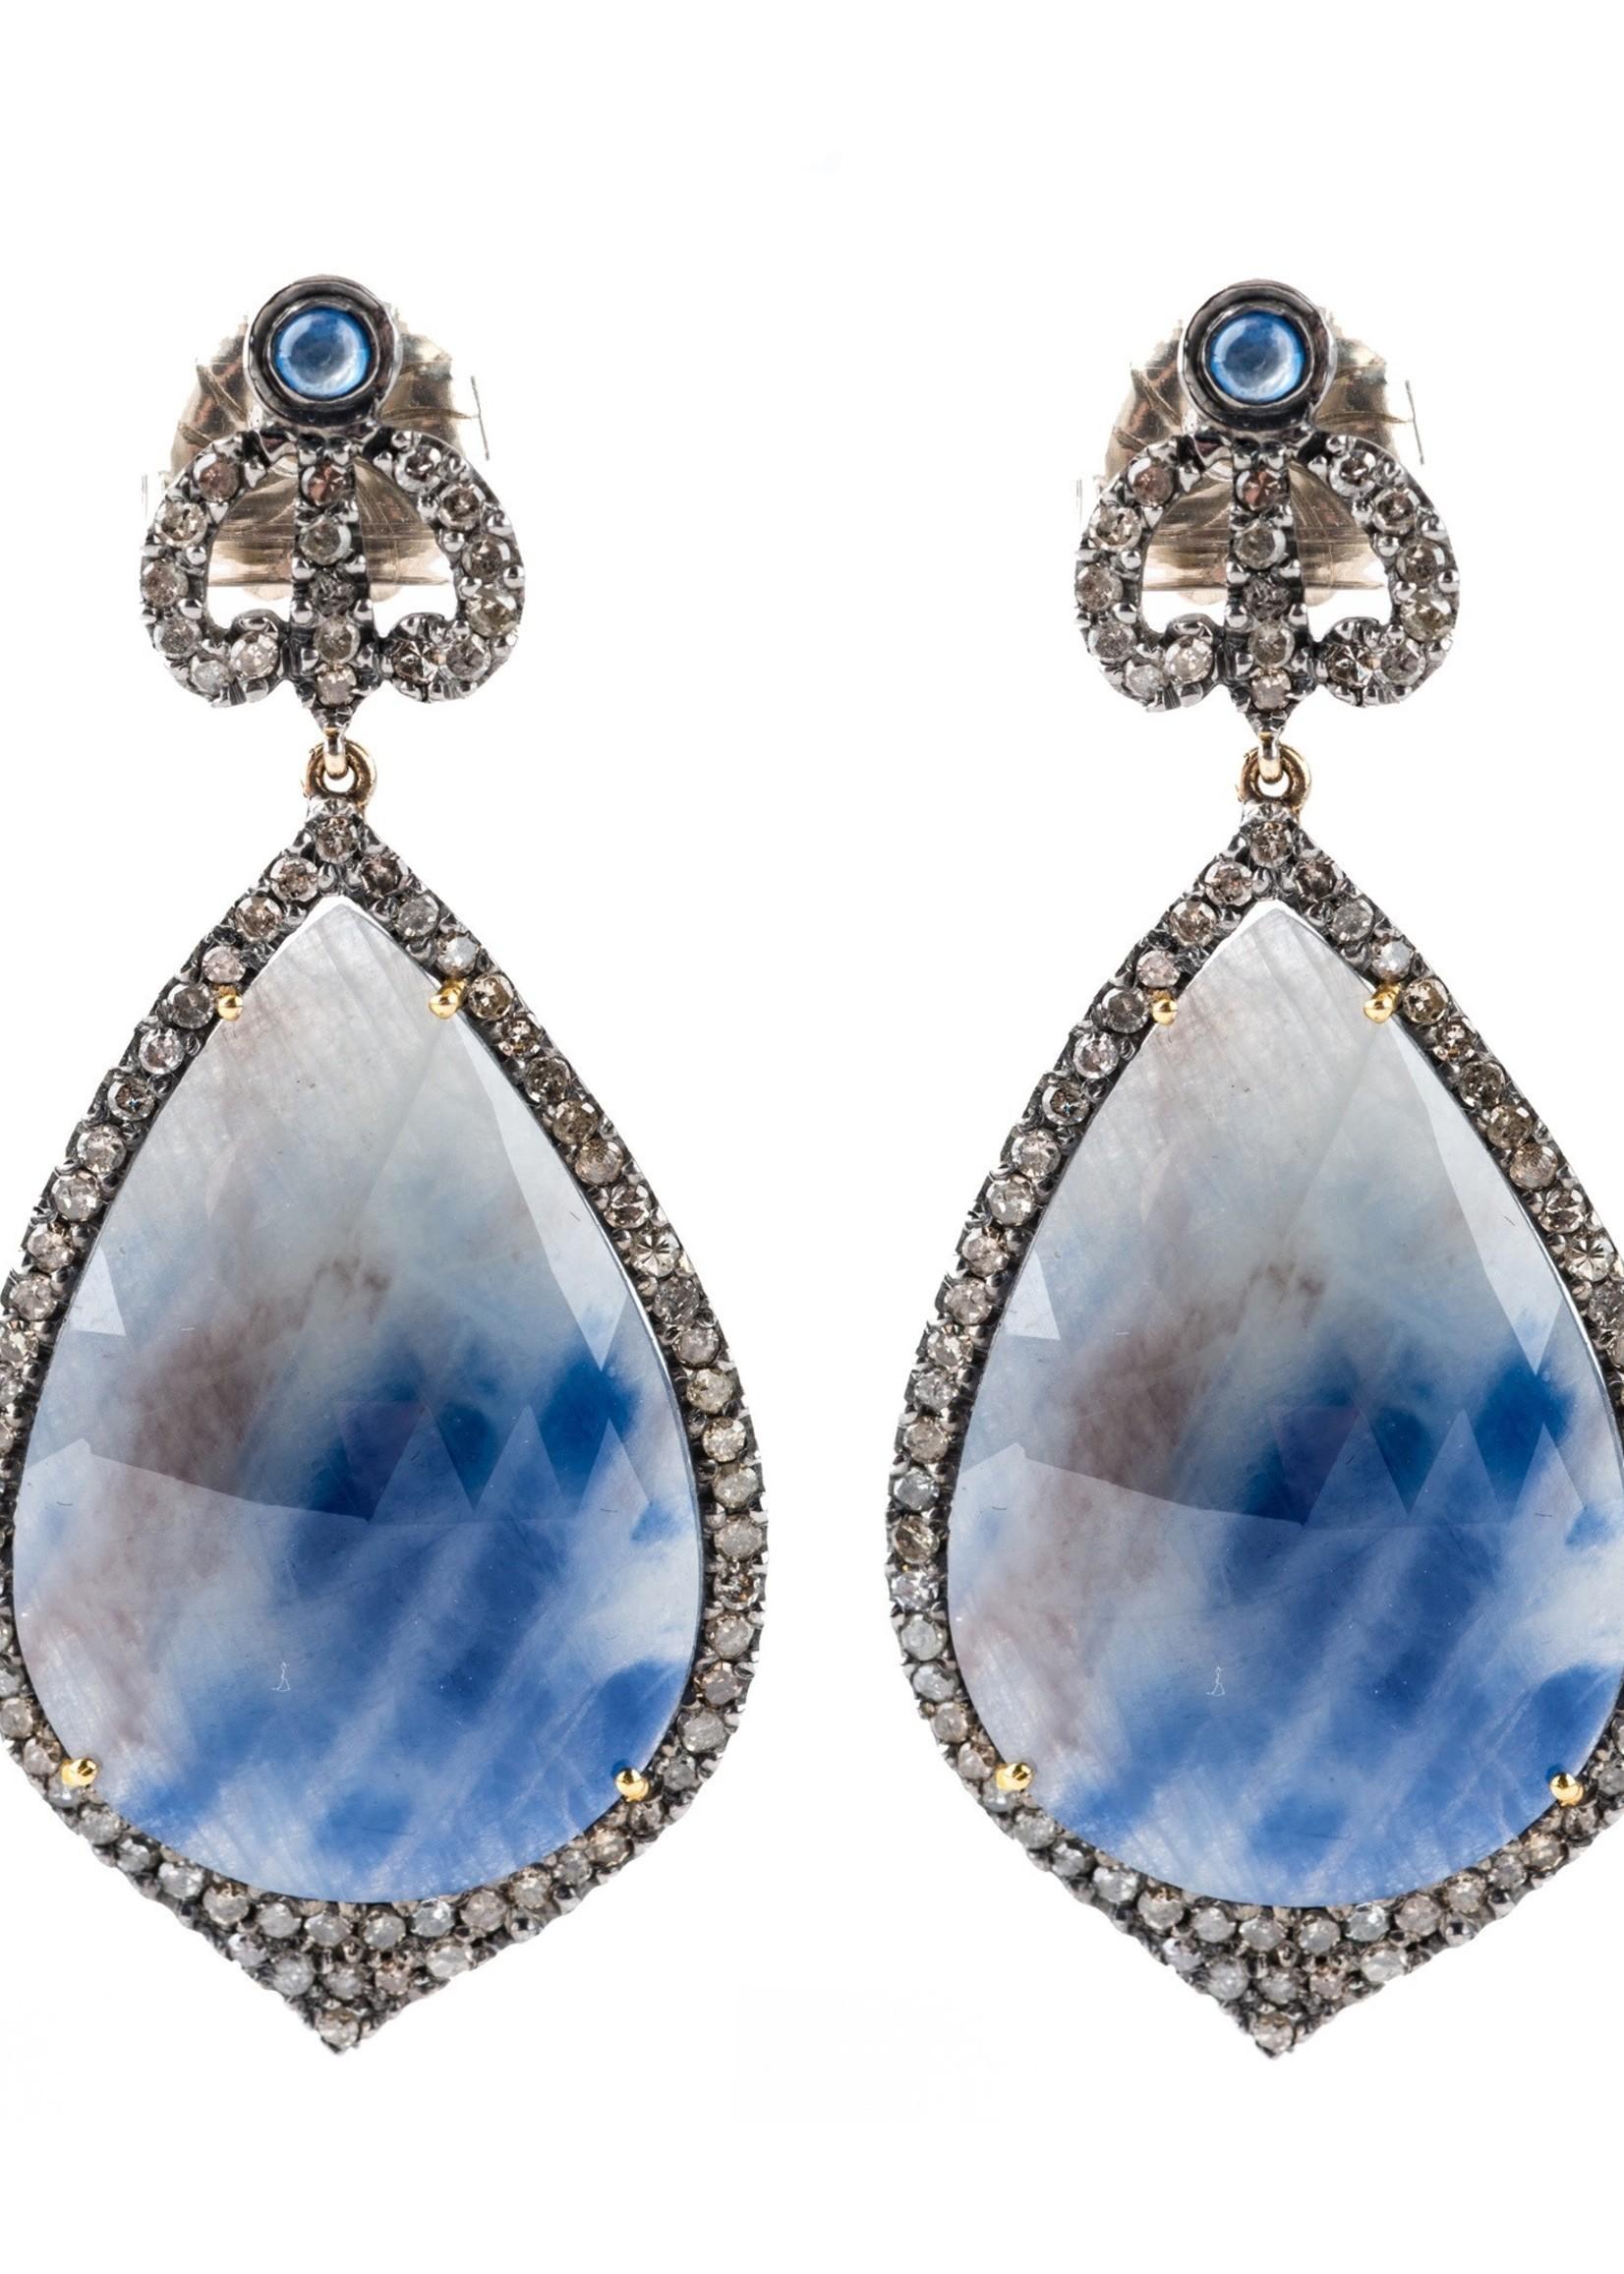 Mina Danielle Teardrop Sapphire and Diamond Earrings with Crown Diamond Tops